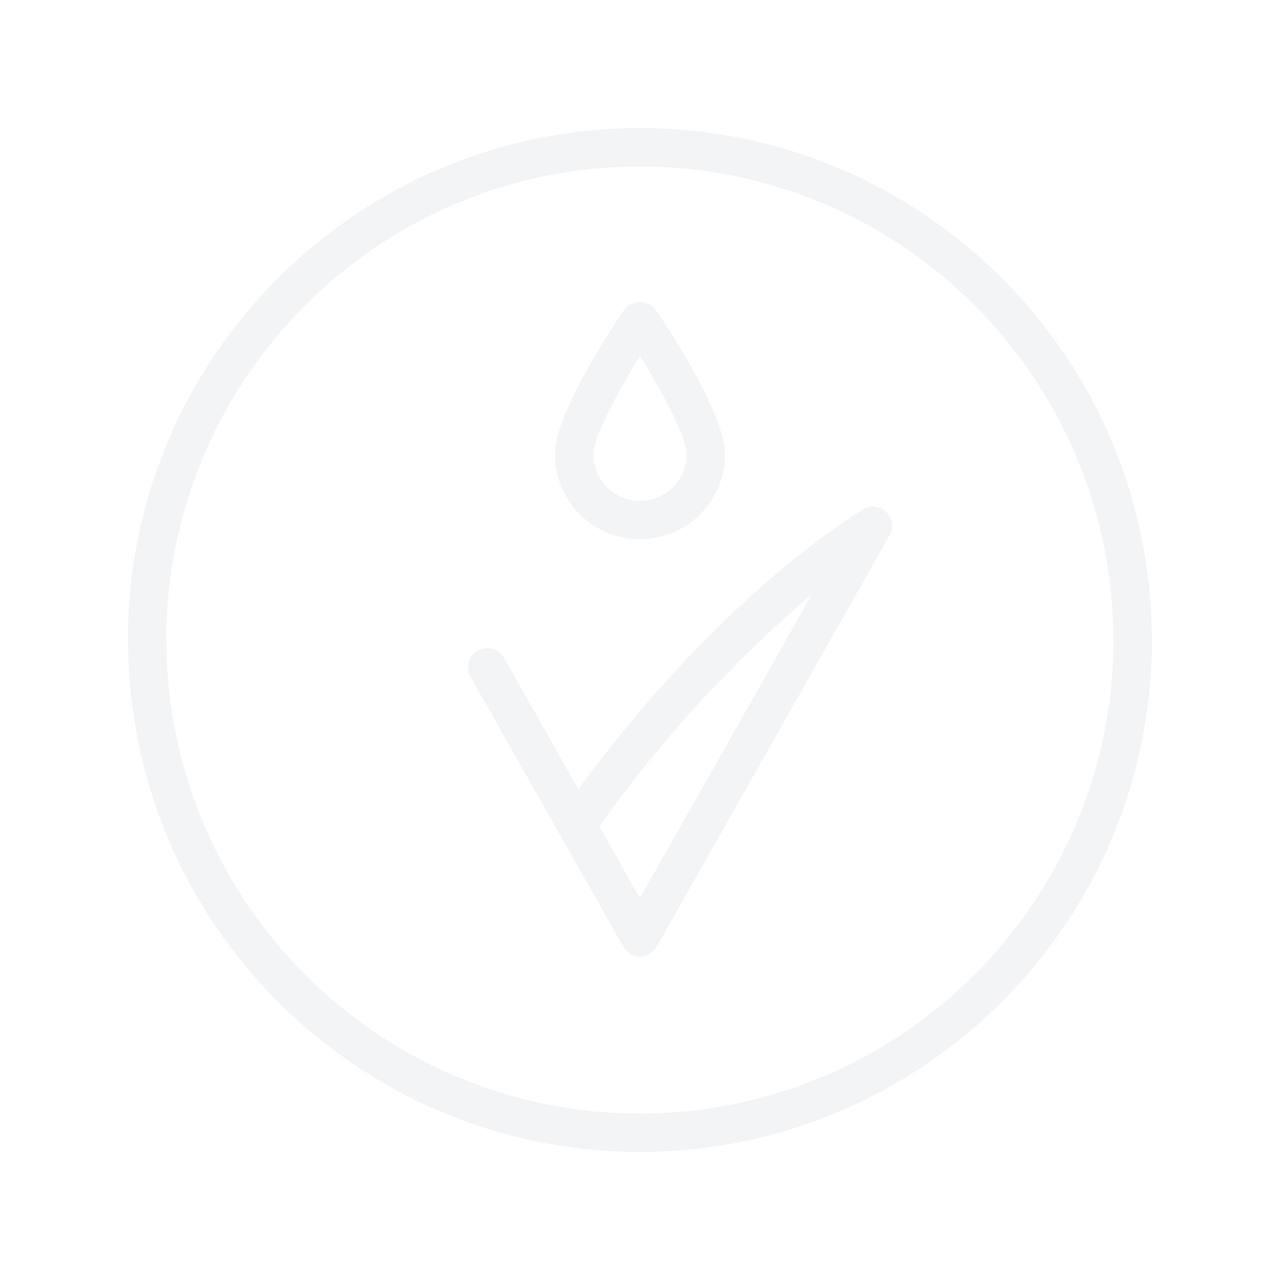 Collistar Pure Actives Glycolic Acid Rich Cream 50ml